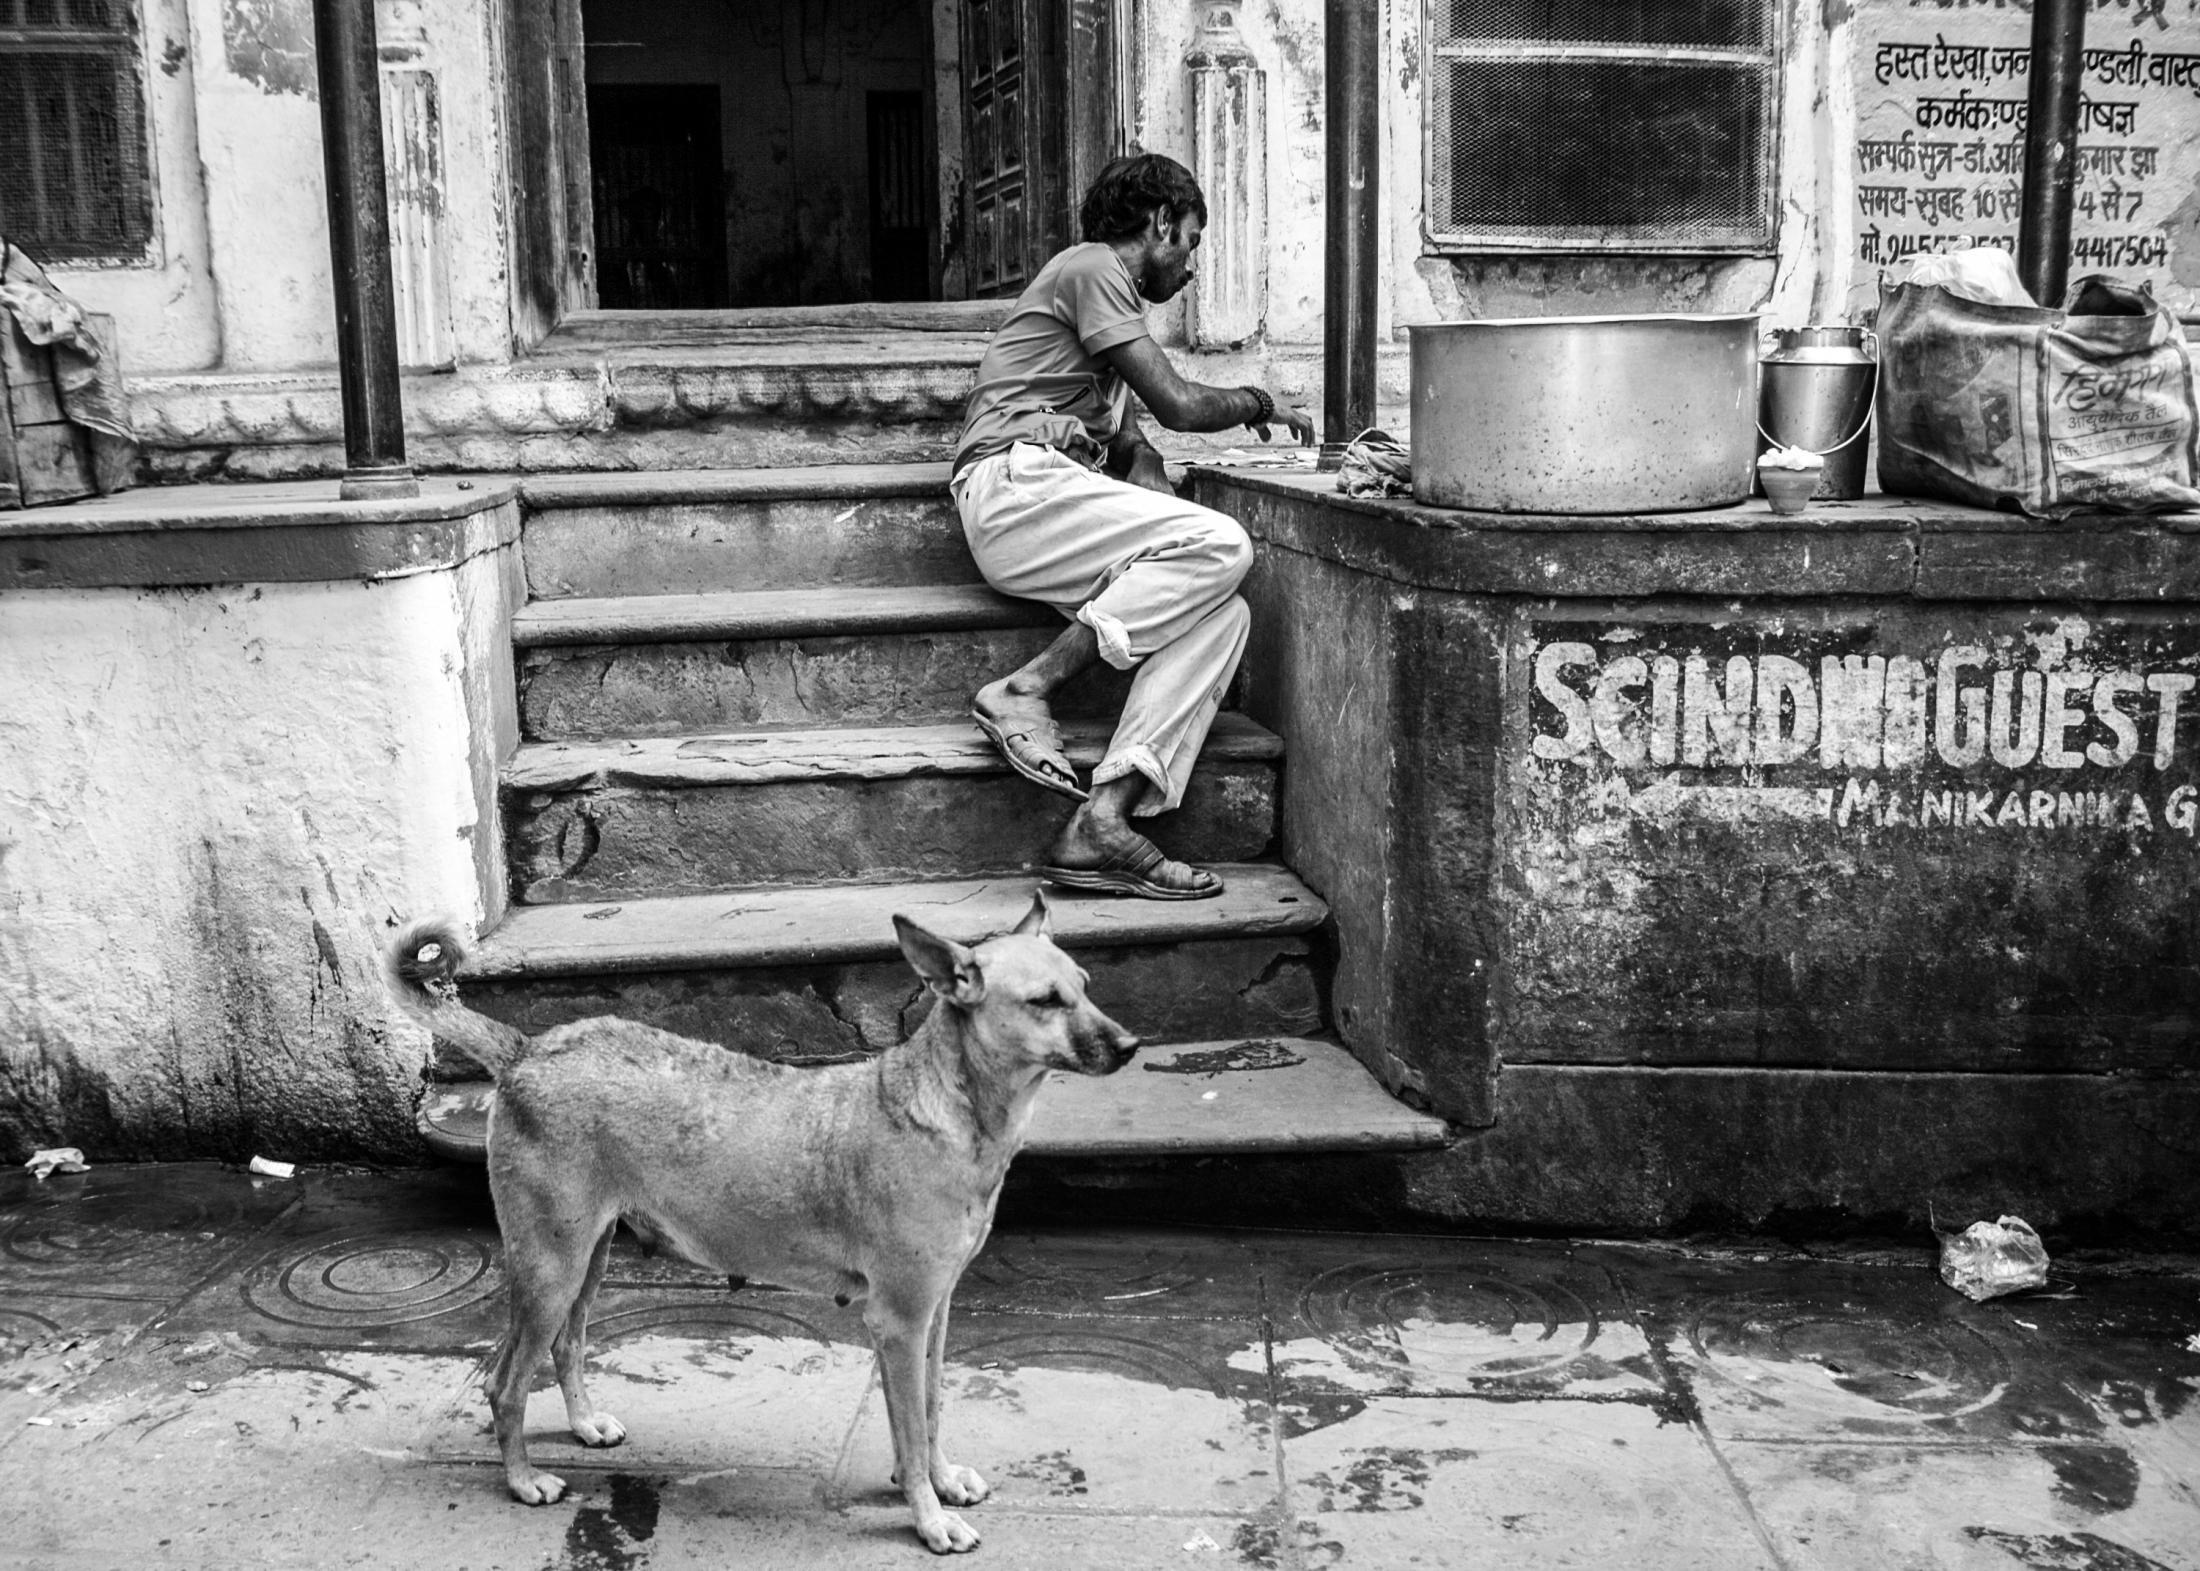 Varanasi, India 2012